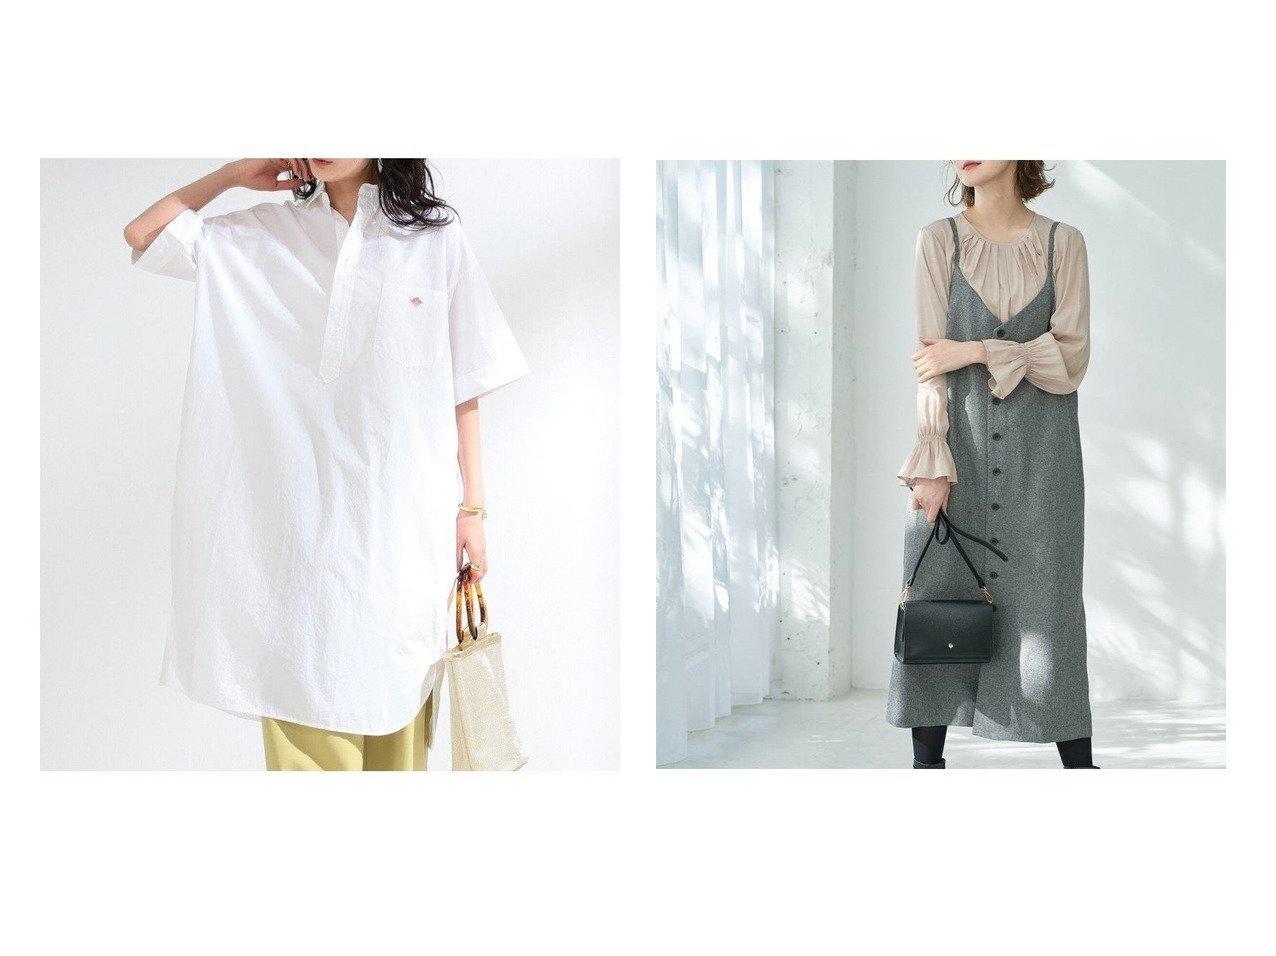 【Ray BEAMS/レイ ビームス】のコットン ポプリン ワンピース&【Rope Picnic/ロペピクニック】のツイードキャミワンピース ワンピース・ドレスのおすすめ!人気、トレンド・レディースファッションの通販 おすすめで人気の流行・トレンド、ファッションの通販商品 メンズファッション・キッズファッション・インテリア・家具・レディースファッション・服の通販 founy(ファニー) https://founy.com/ ファッション Fashion レディースファッション WOMEN ワンピース Dress シャツワンピース Shirt Dresses キャミワンピース No Sleeve Dresses シンプル フランス リラックス ワーク カットソー キャミソール キャミワンピース ツイード フロント ポケット 春 Spring |ID:crp329100000014758